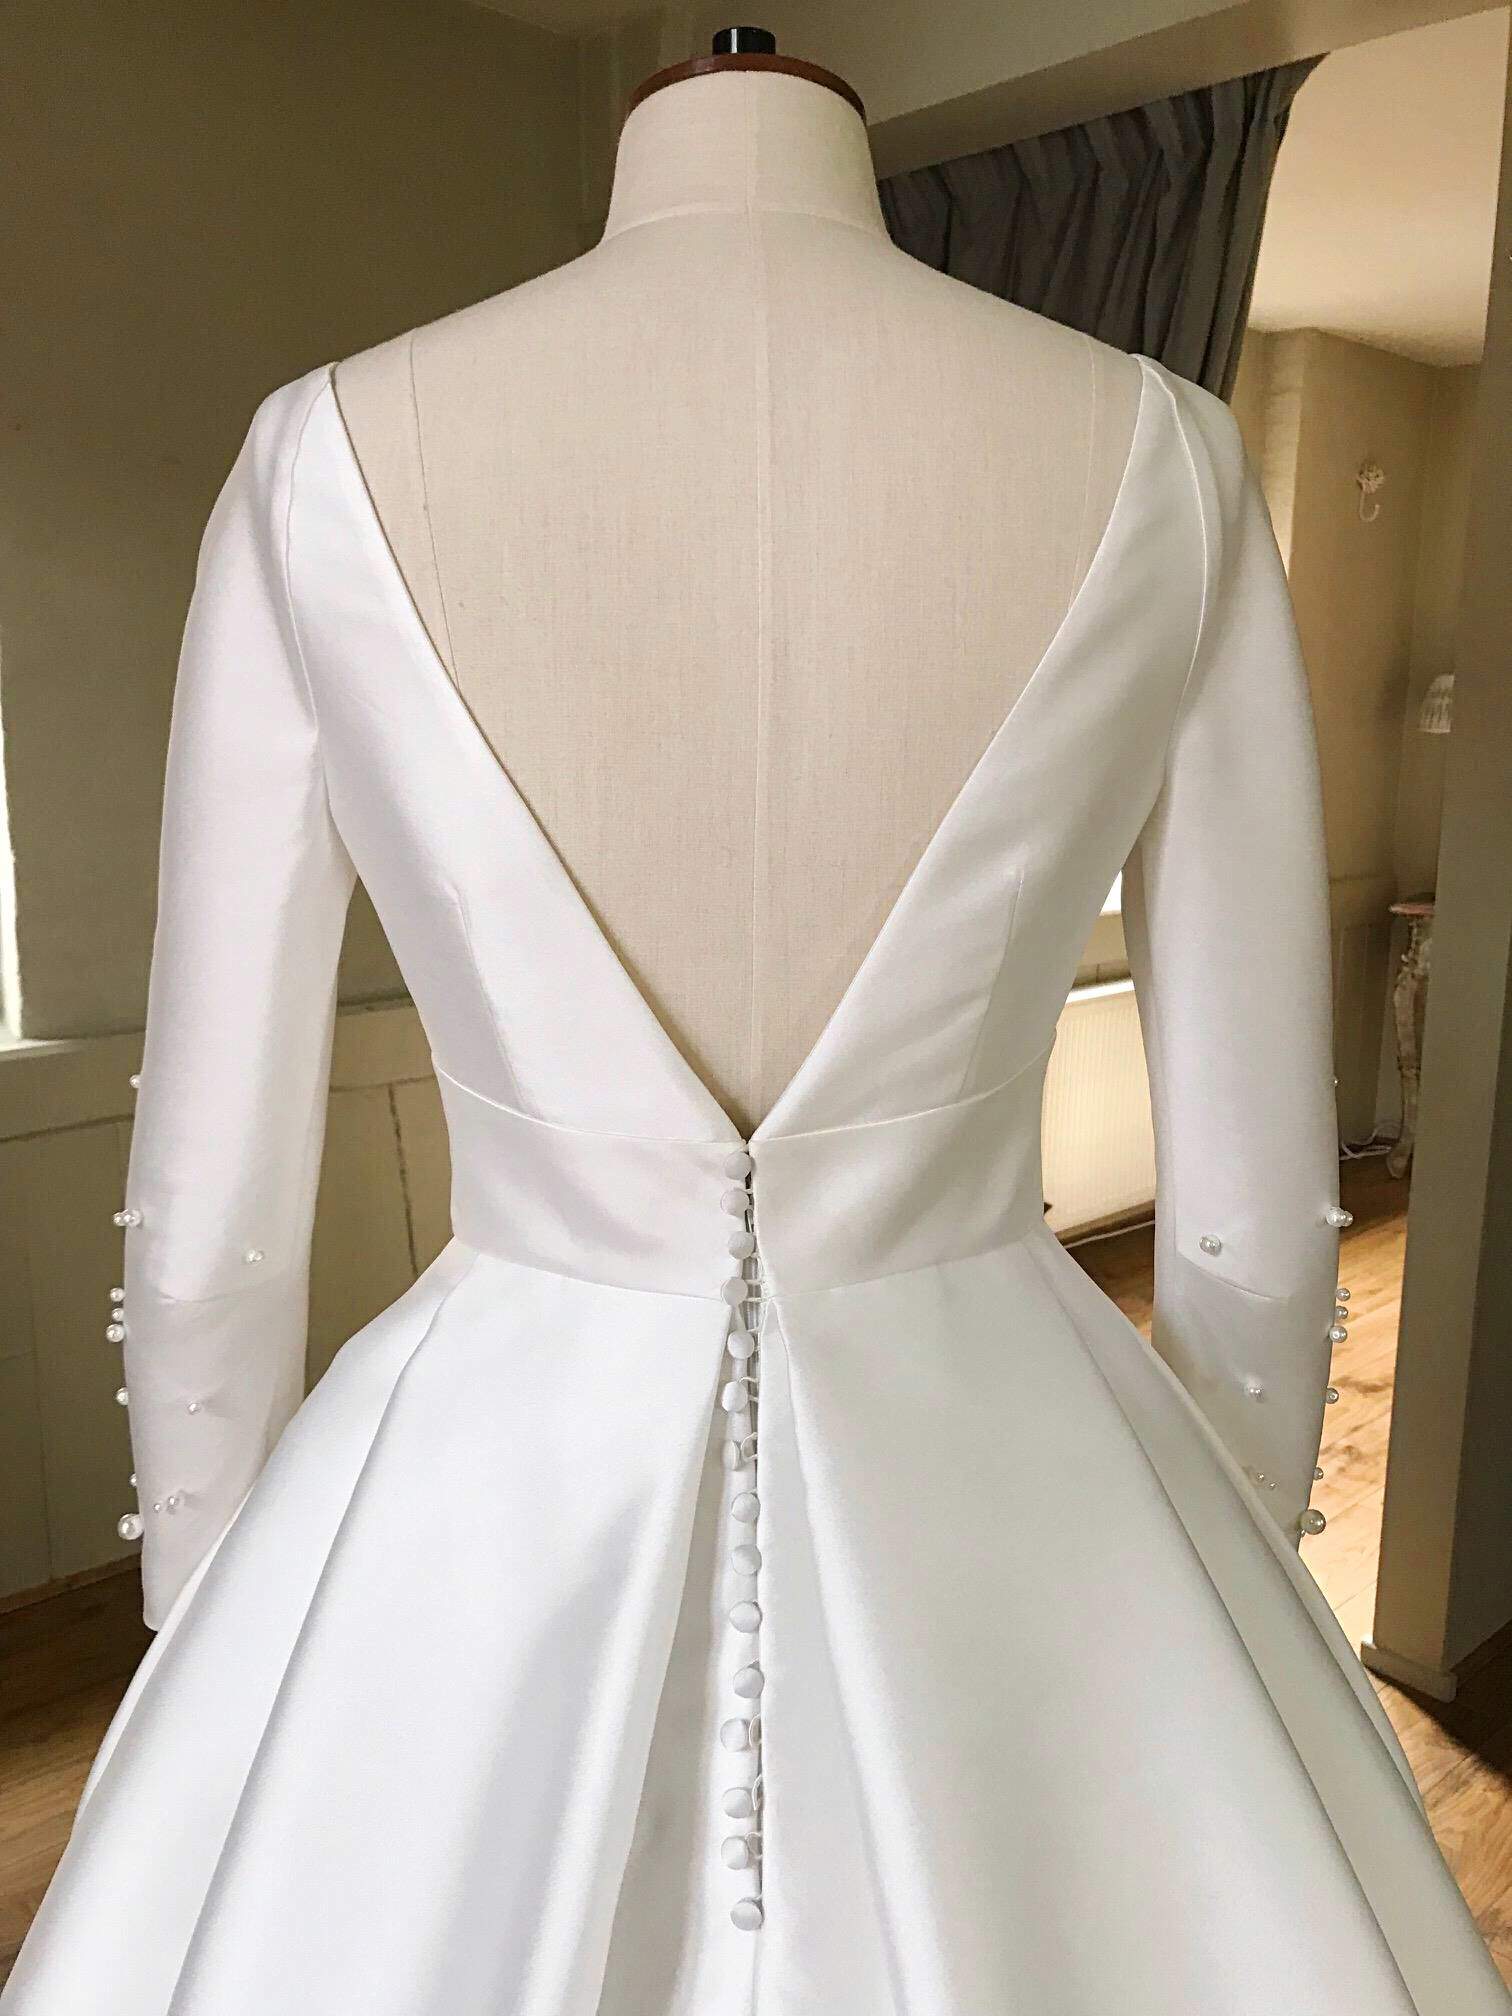 3aea79c858f Meghan Markle s Wedding Dress - what will she wear